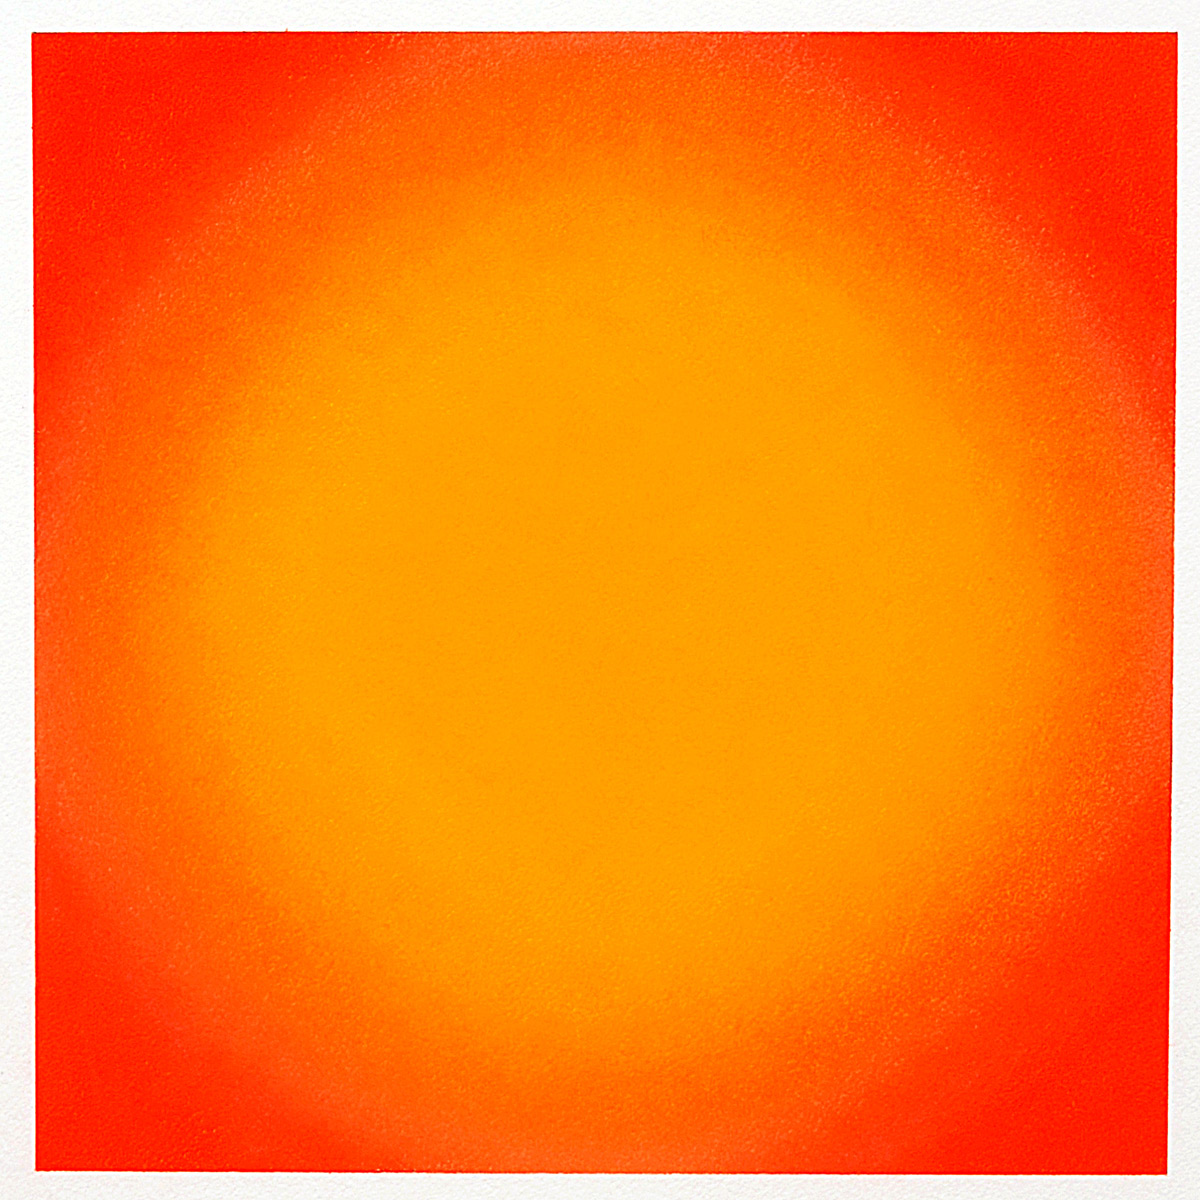 Warm-Light Yellow-Orange, Circle, Warm-Light Cool-Light Series, 2012, pastel on paper, image: 14 x 14 in. (36 x 36 cm.), sheet: 30 x 22 in. (76 x 56 cm.)